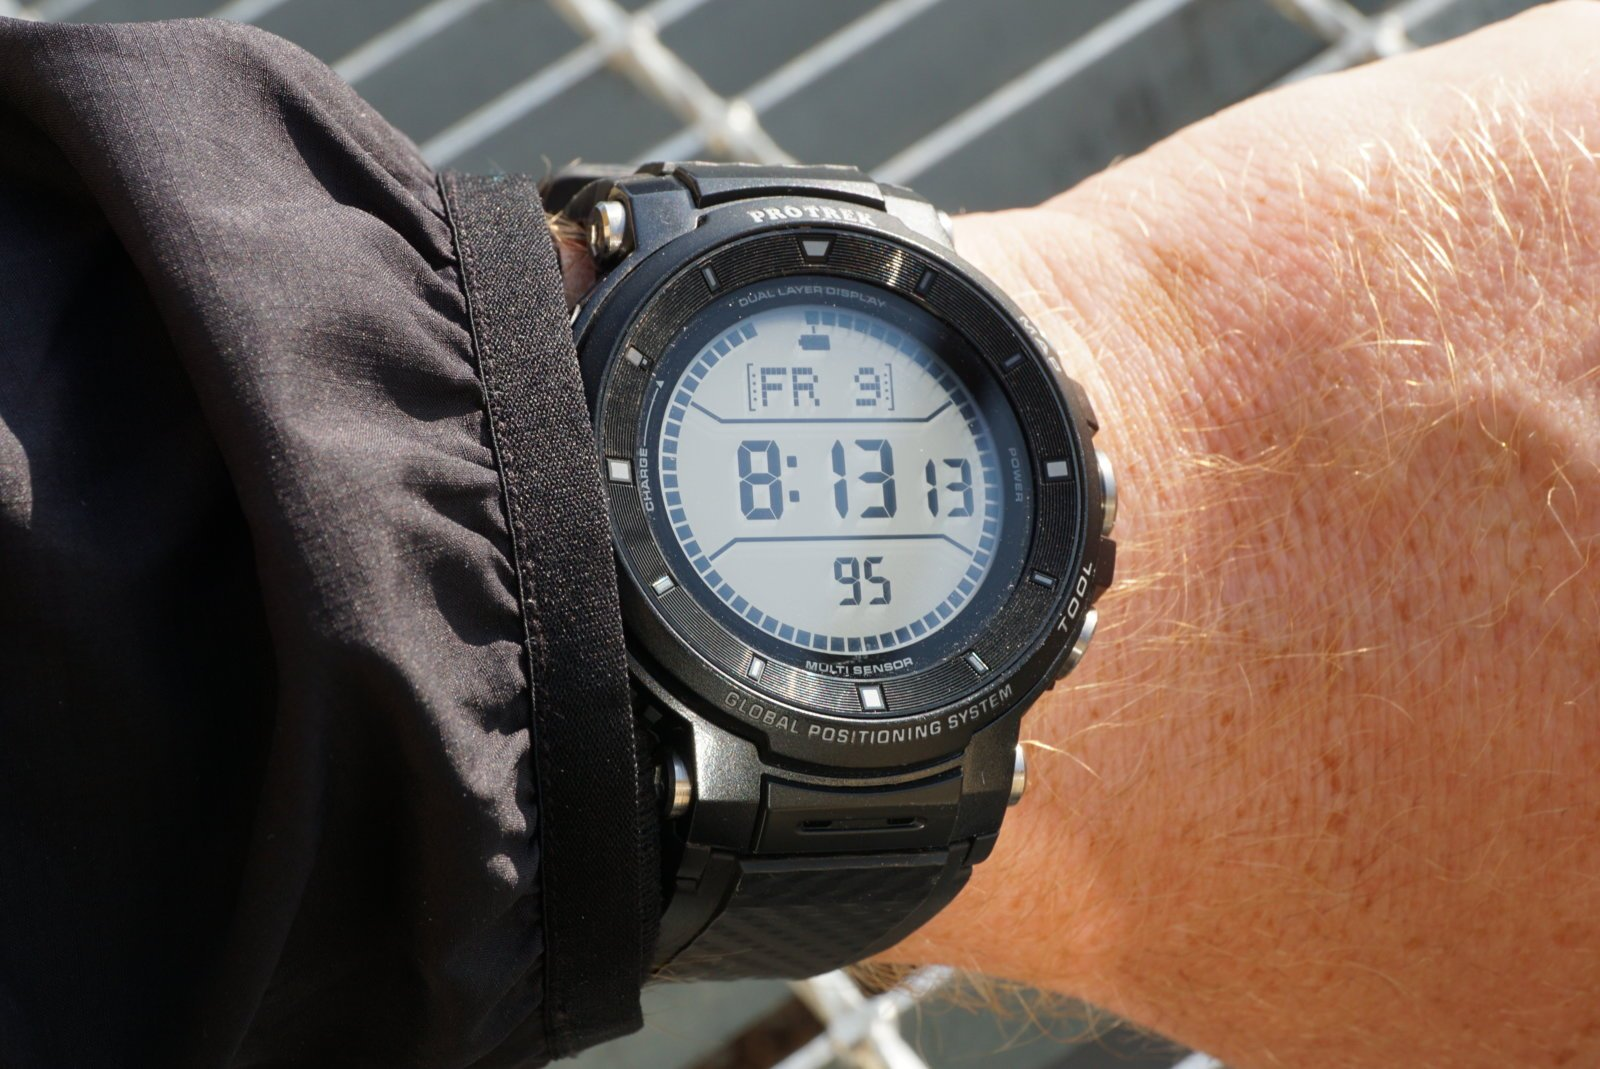 ABD8B3FC-376E-43B8-A3B4-A19372DCB756.jpeg